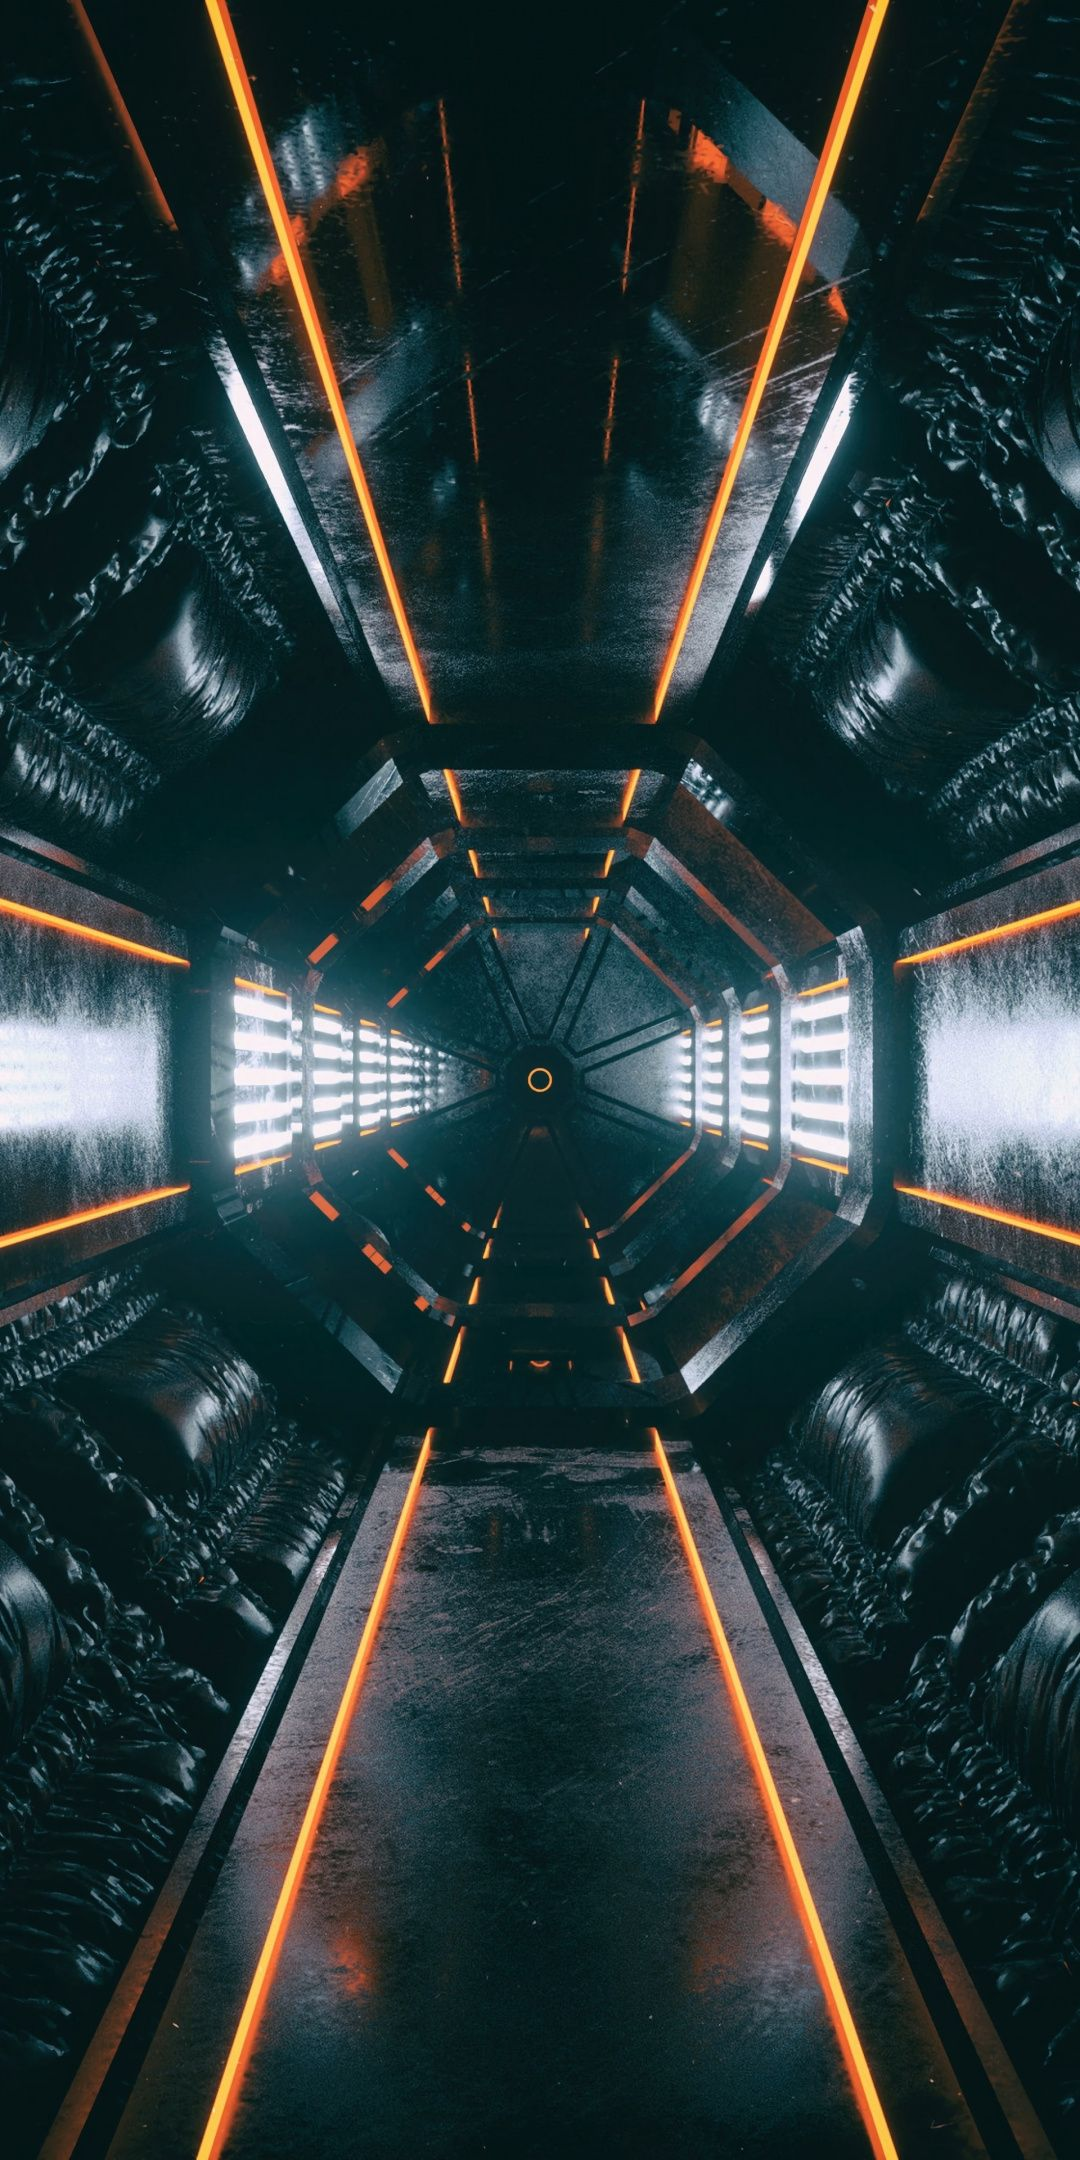 Orirod Space Room Glow Tunnel 1080x2160 Wallpaper Technology Wallpaper Dark Wallpaper Sci Fi Environment